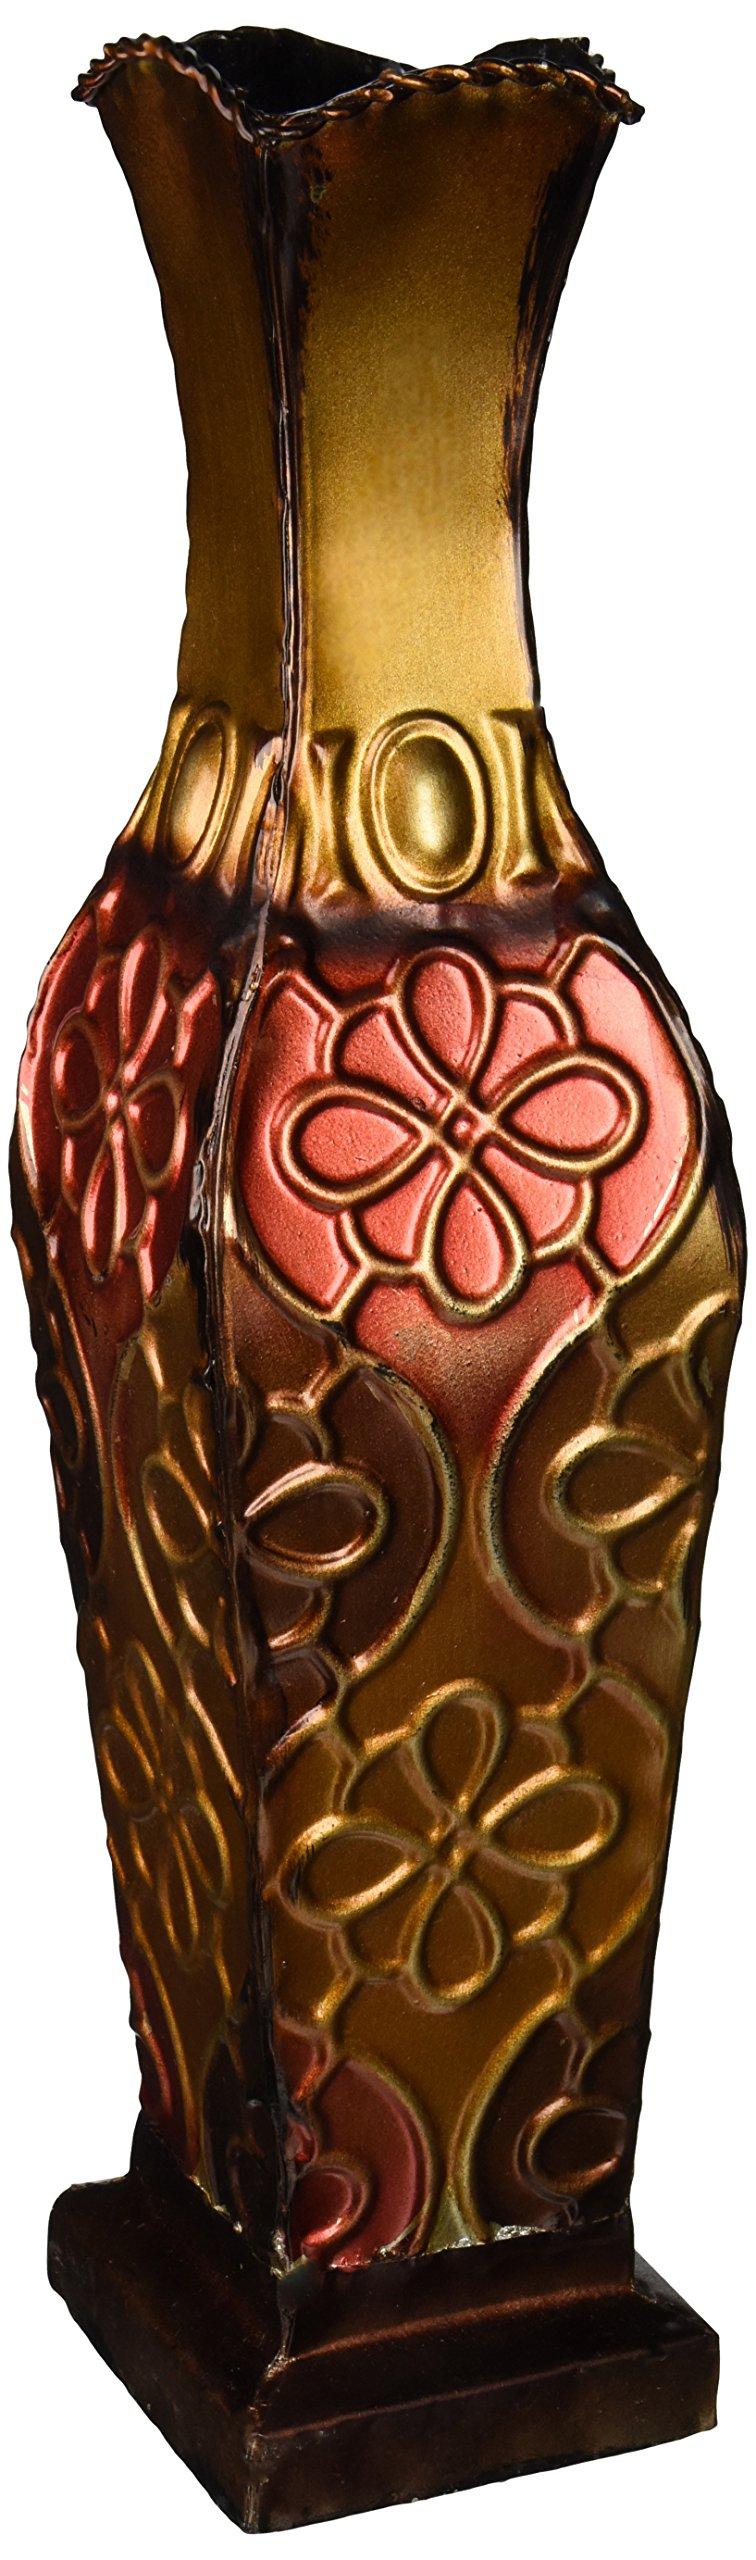 Elements Embossed Metal Floral Decorative Vase, 17-Inch